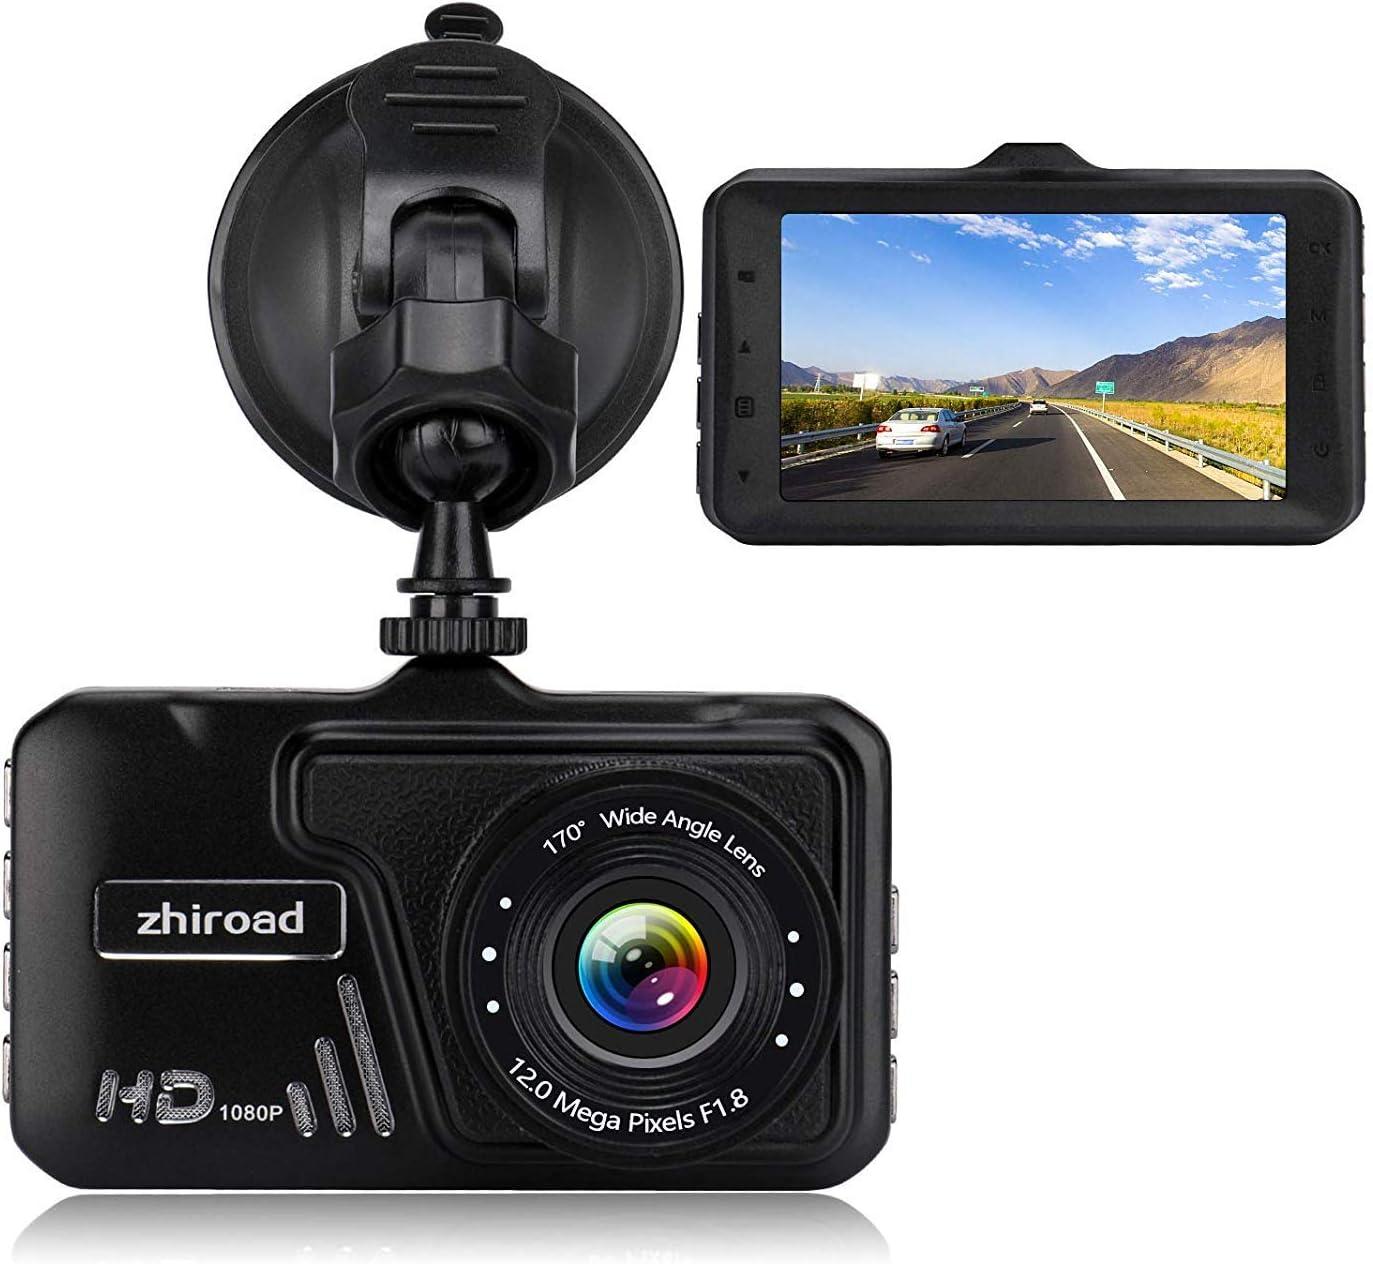 6 IR LED Night Vision,Loop Recording,Motion Detection,Parking Monitor Upgraded Dash Cam 1080P Full HD Dashboard Camera Recorder with High Sensitive G-sensor